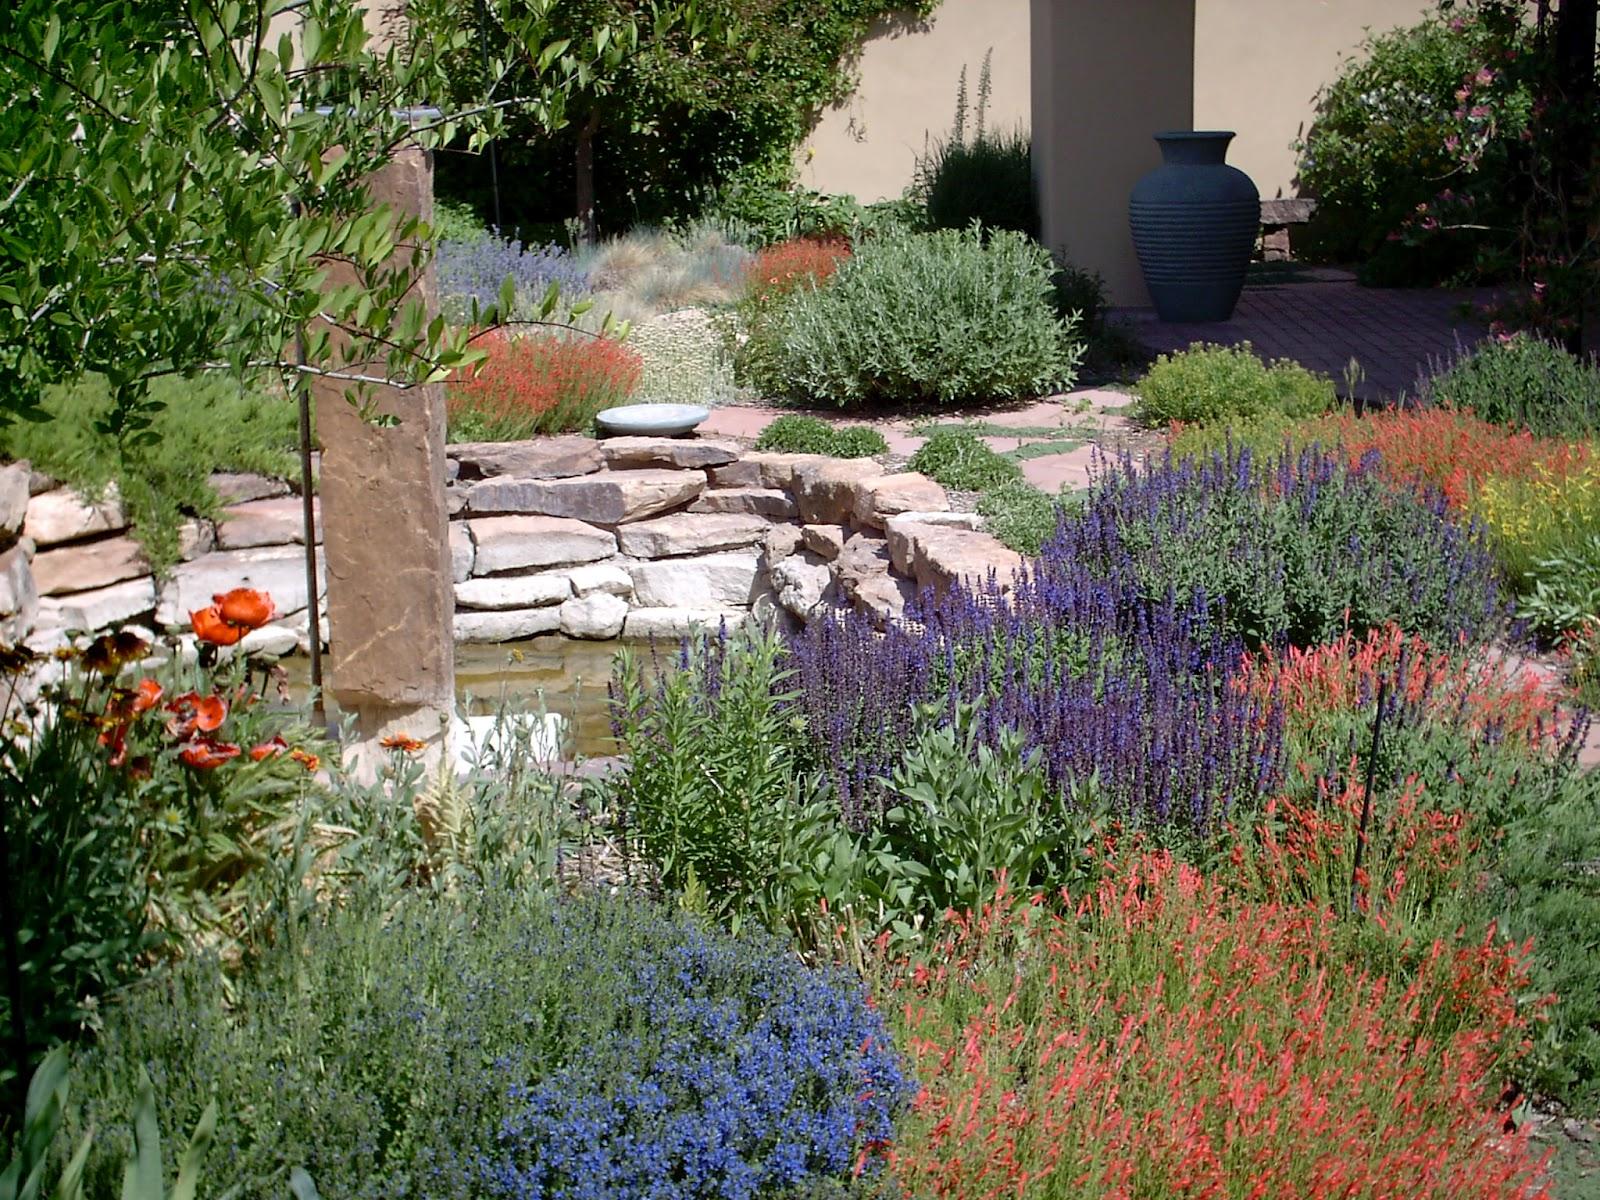 Landscaping Ideas, Color, Backyard Inspirations, Xeriscape ... on Backyard Xeriscape Designs id=81139